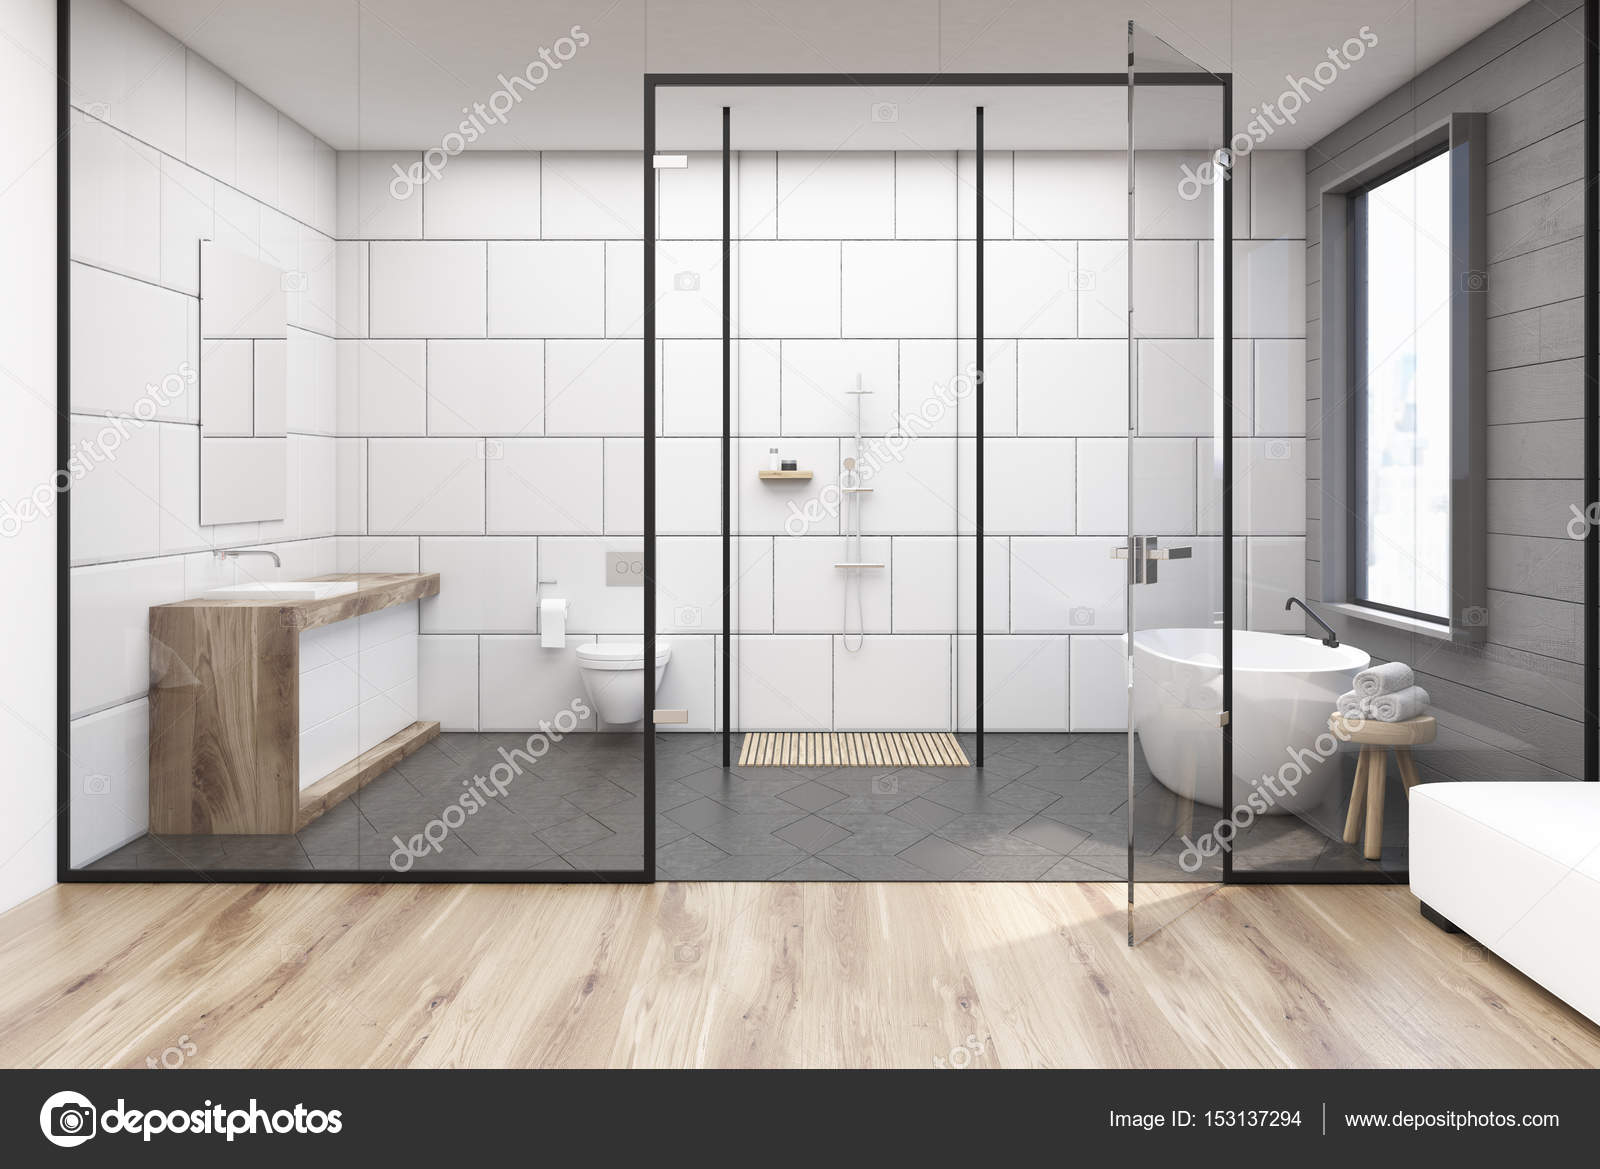 Glazen muur badkamer — Stockfoto © denisismagilov #153137294